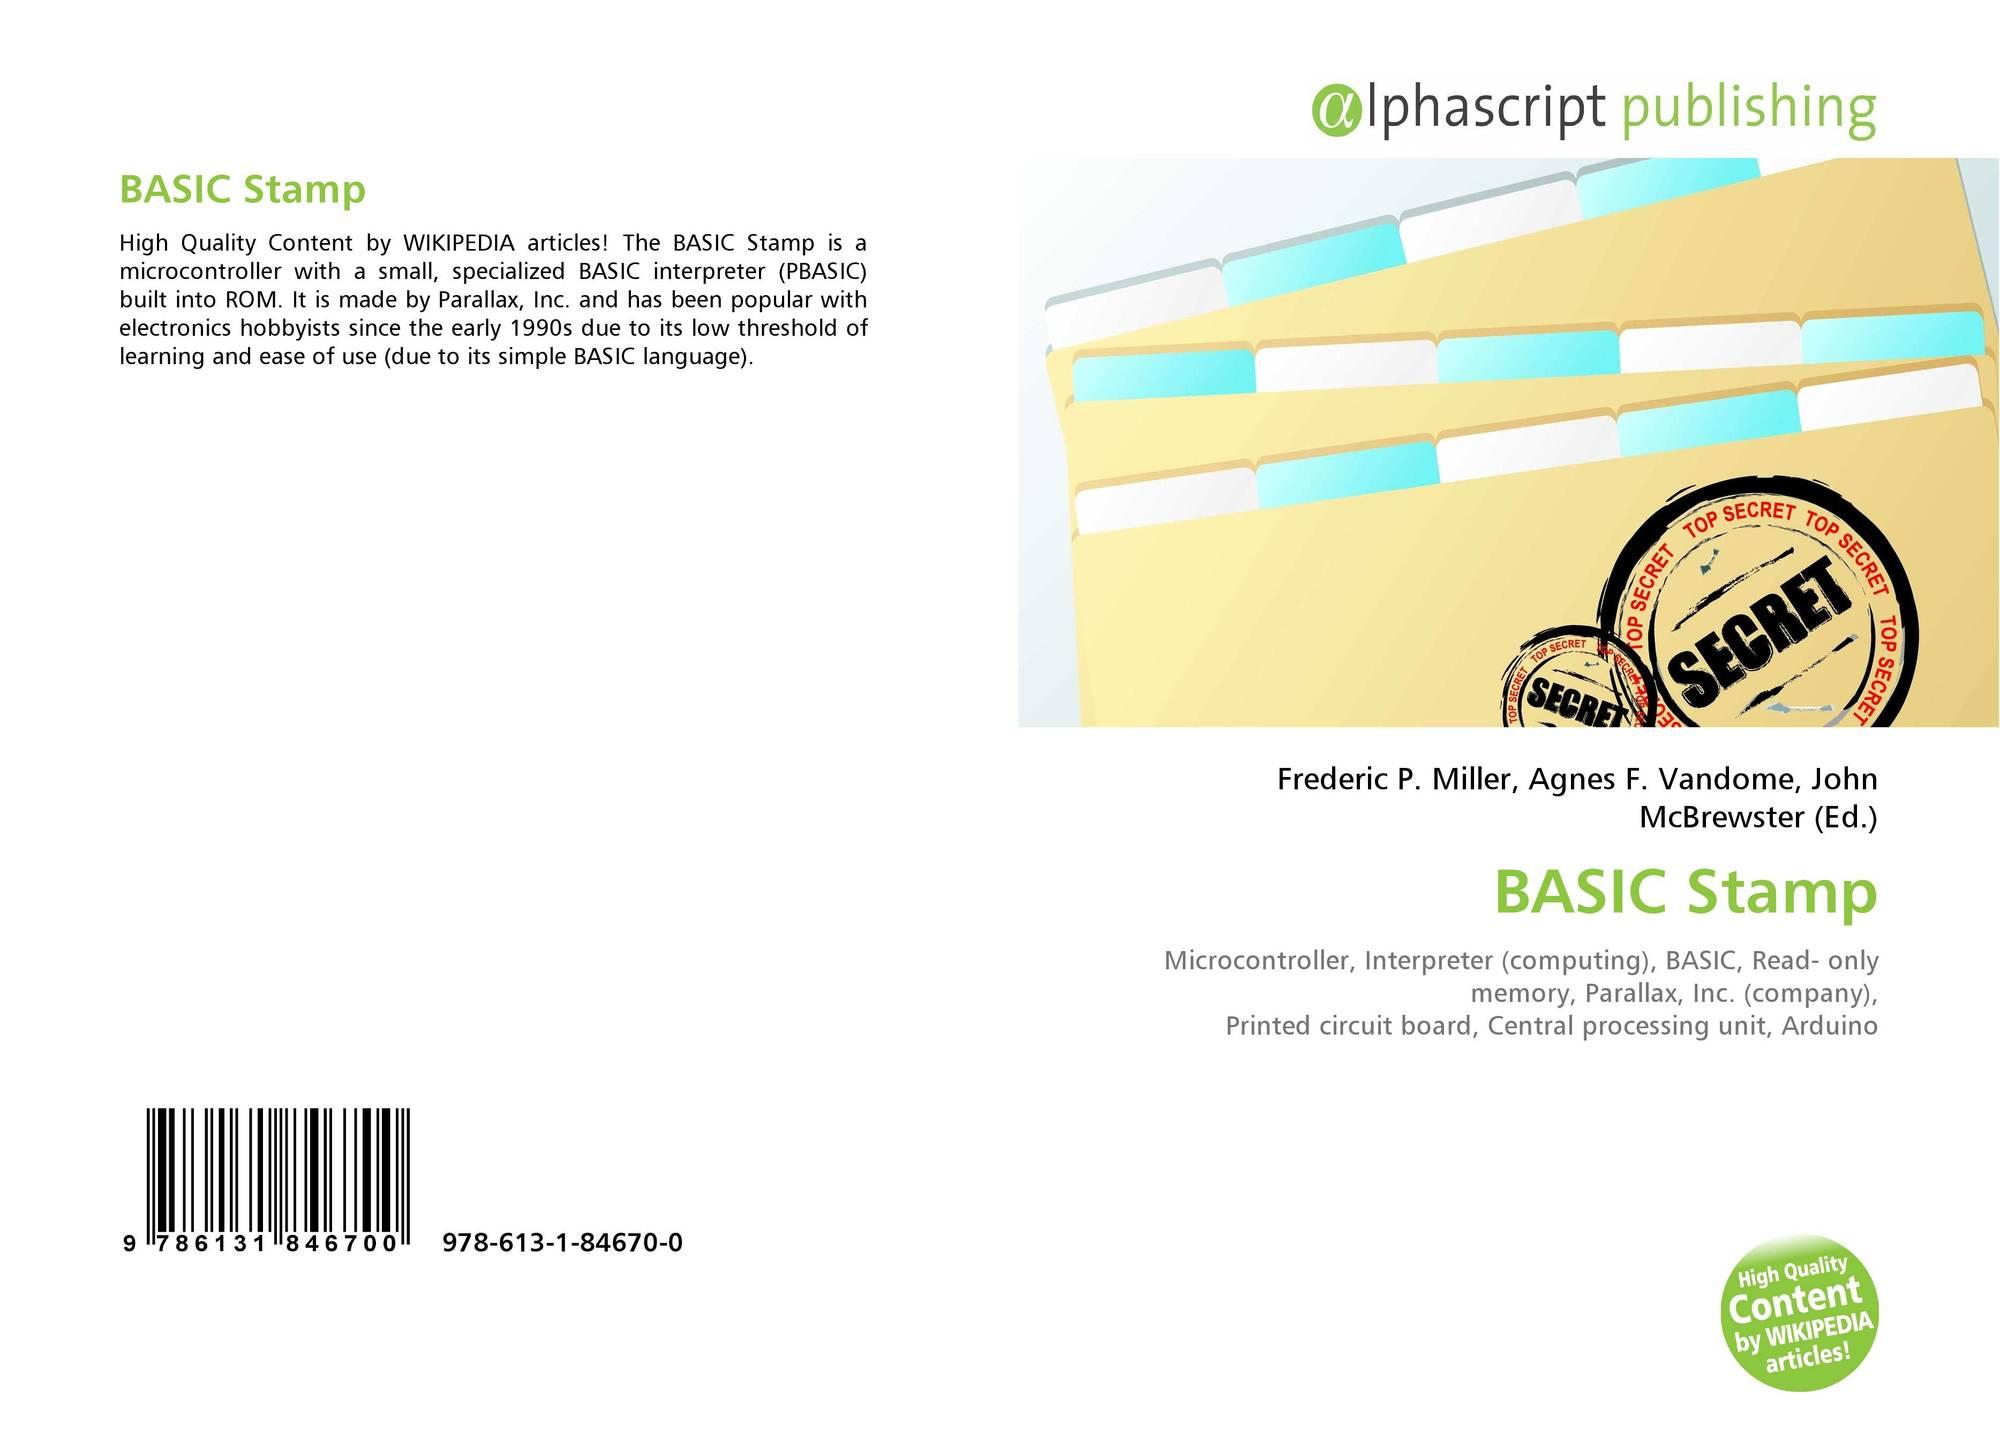 BASIC Stamp, 978-613-1-84670-0, 6131846707 ,9786131846700